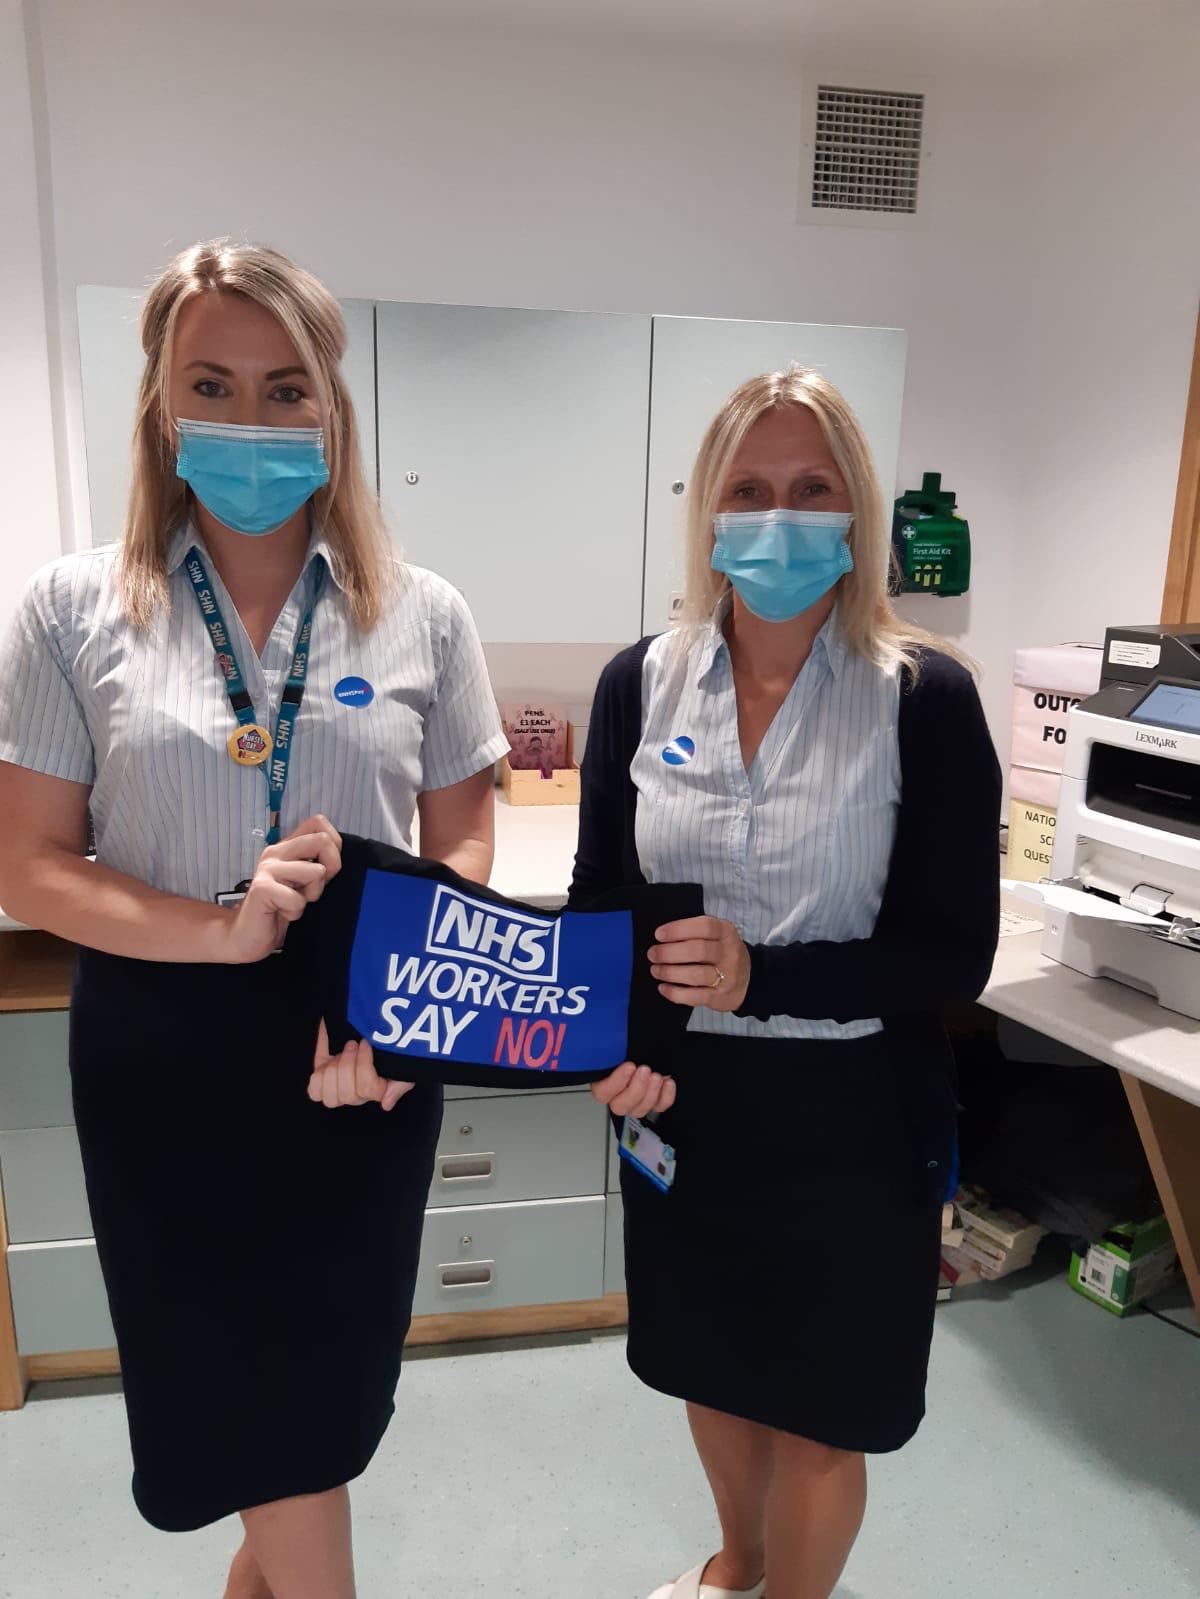 Nurses displaying a banner-Business News